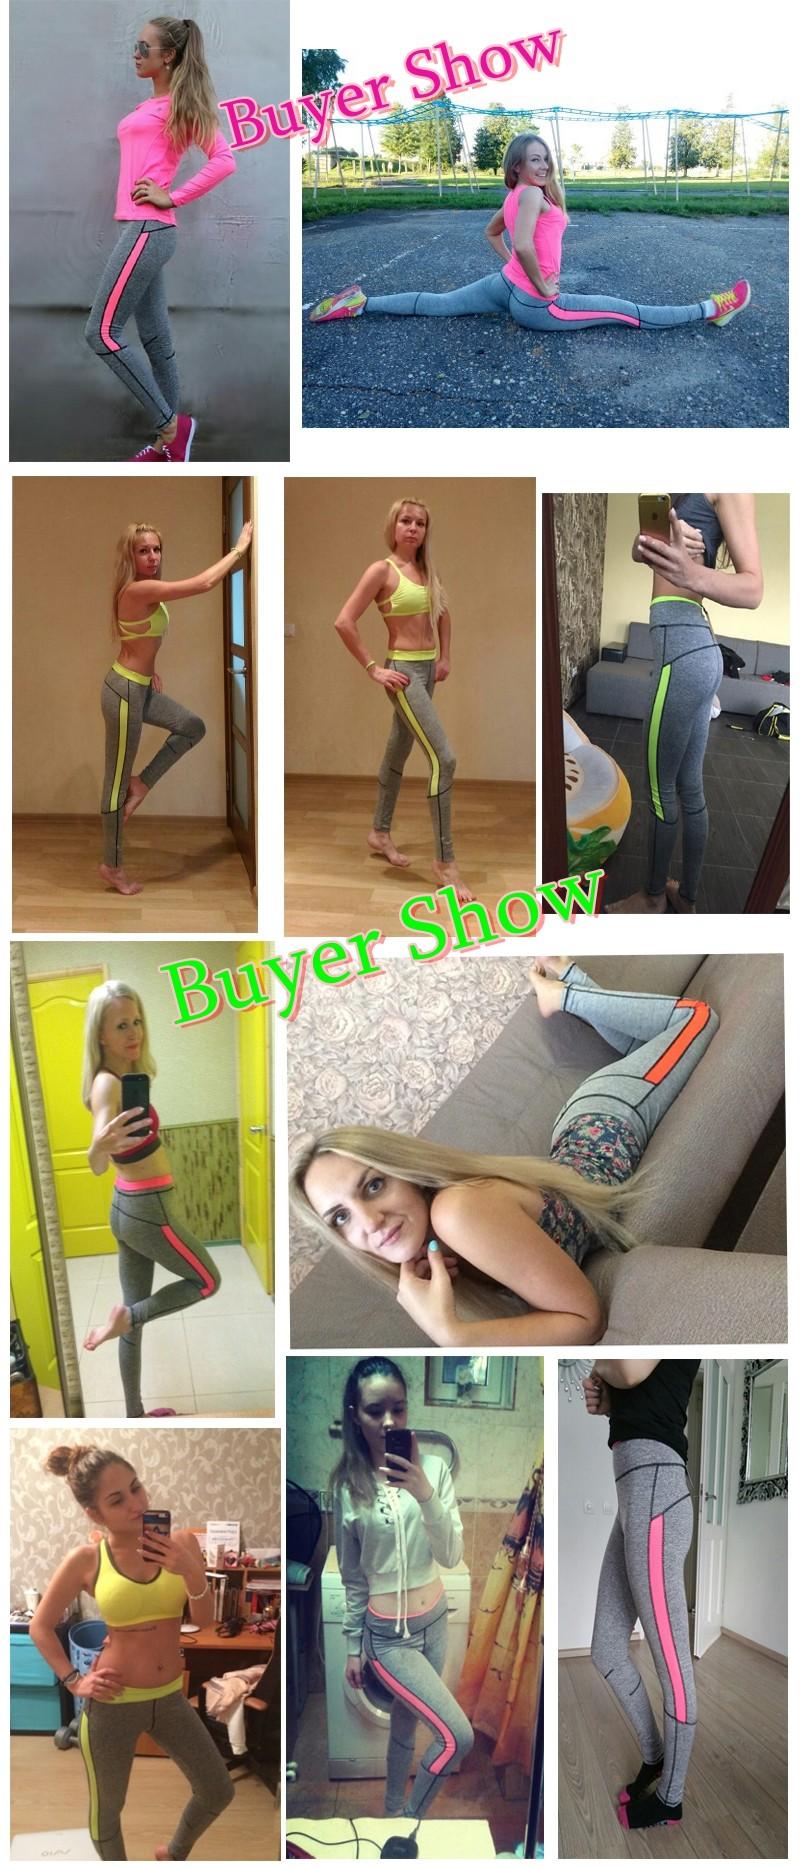 17 Women Lady Activewear Pink Legging Spring Summer light grey Pant Autumn High Waist Leggins 18 American Original Order 3